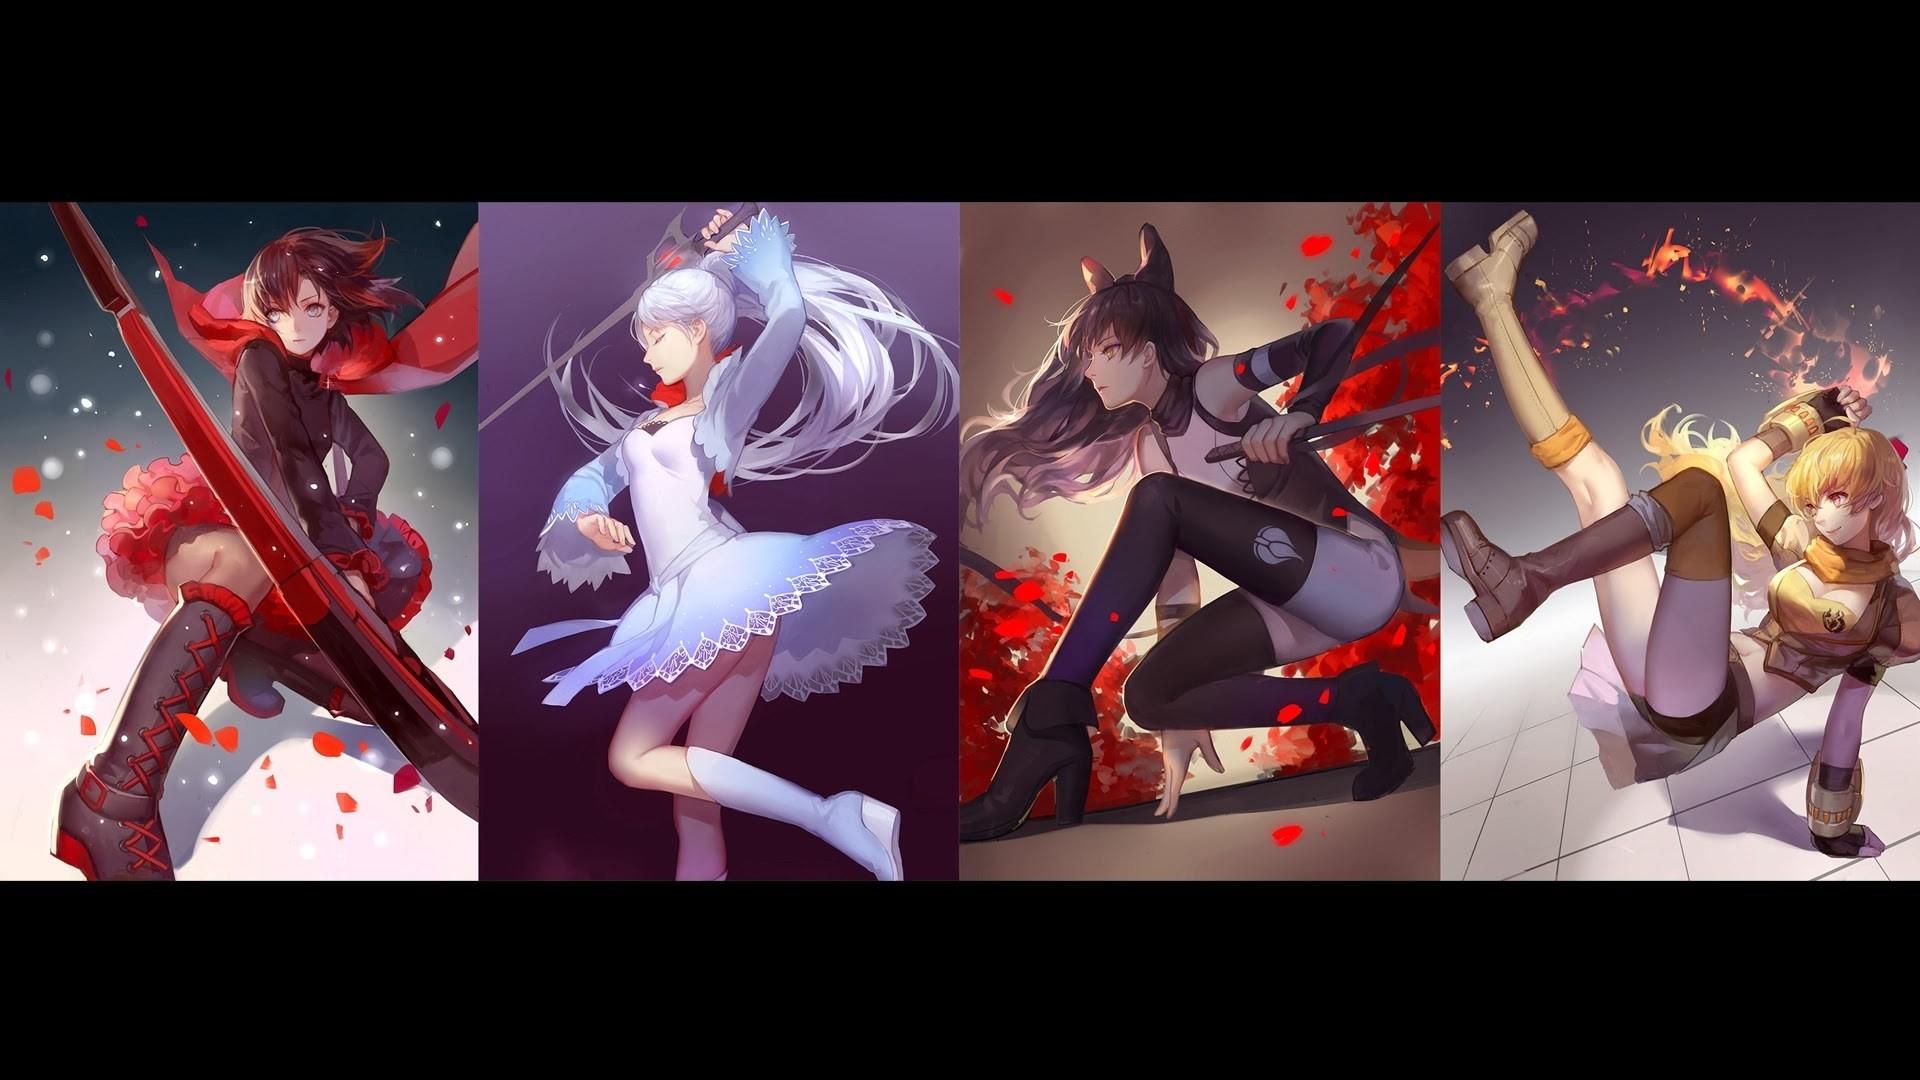 Res: 1920x1080, Yang Xiao Long Weiss Schnee RWBY Ruby Rose Blake Belladonna 1080p HD  Wallpaper Background